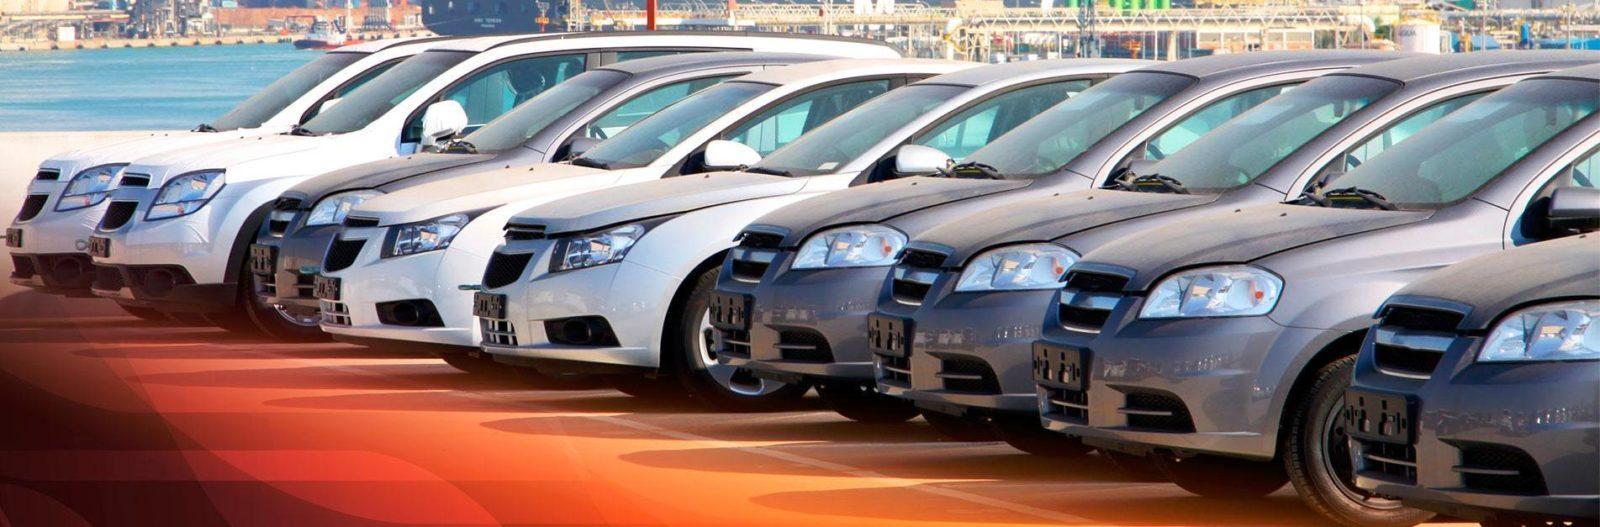 Прокат авто в Болгарии